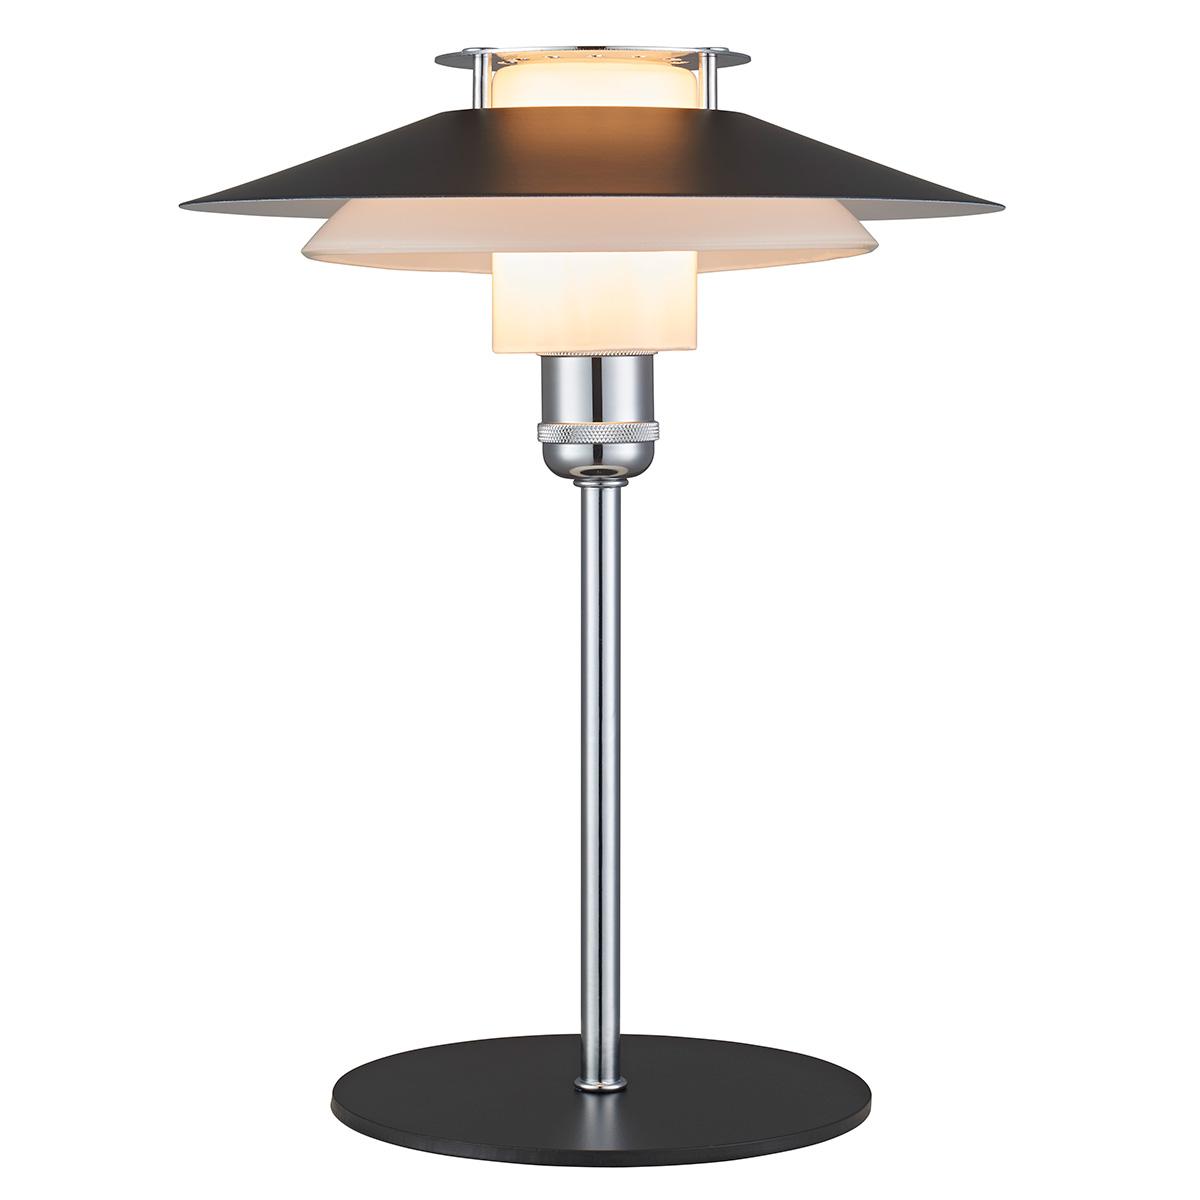 Image of   Halo Design bordlampe - Rivalto - Sort/krom